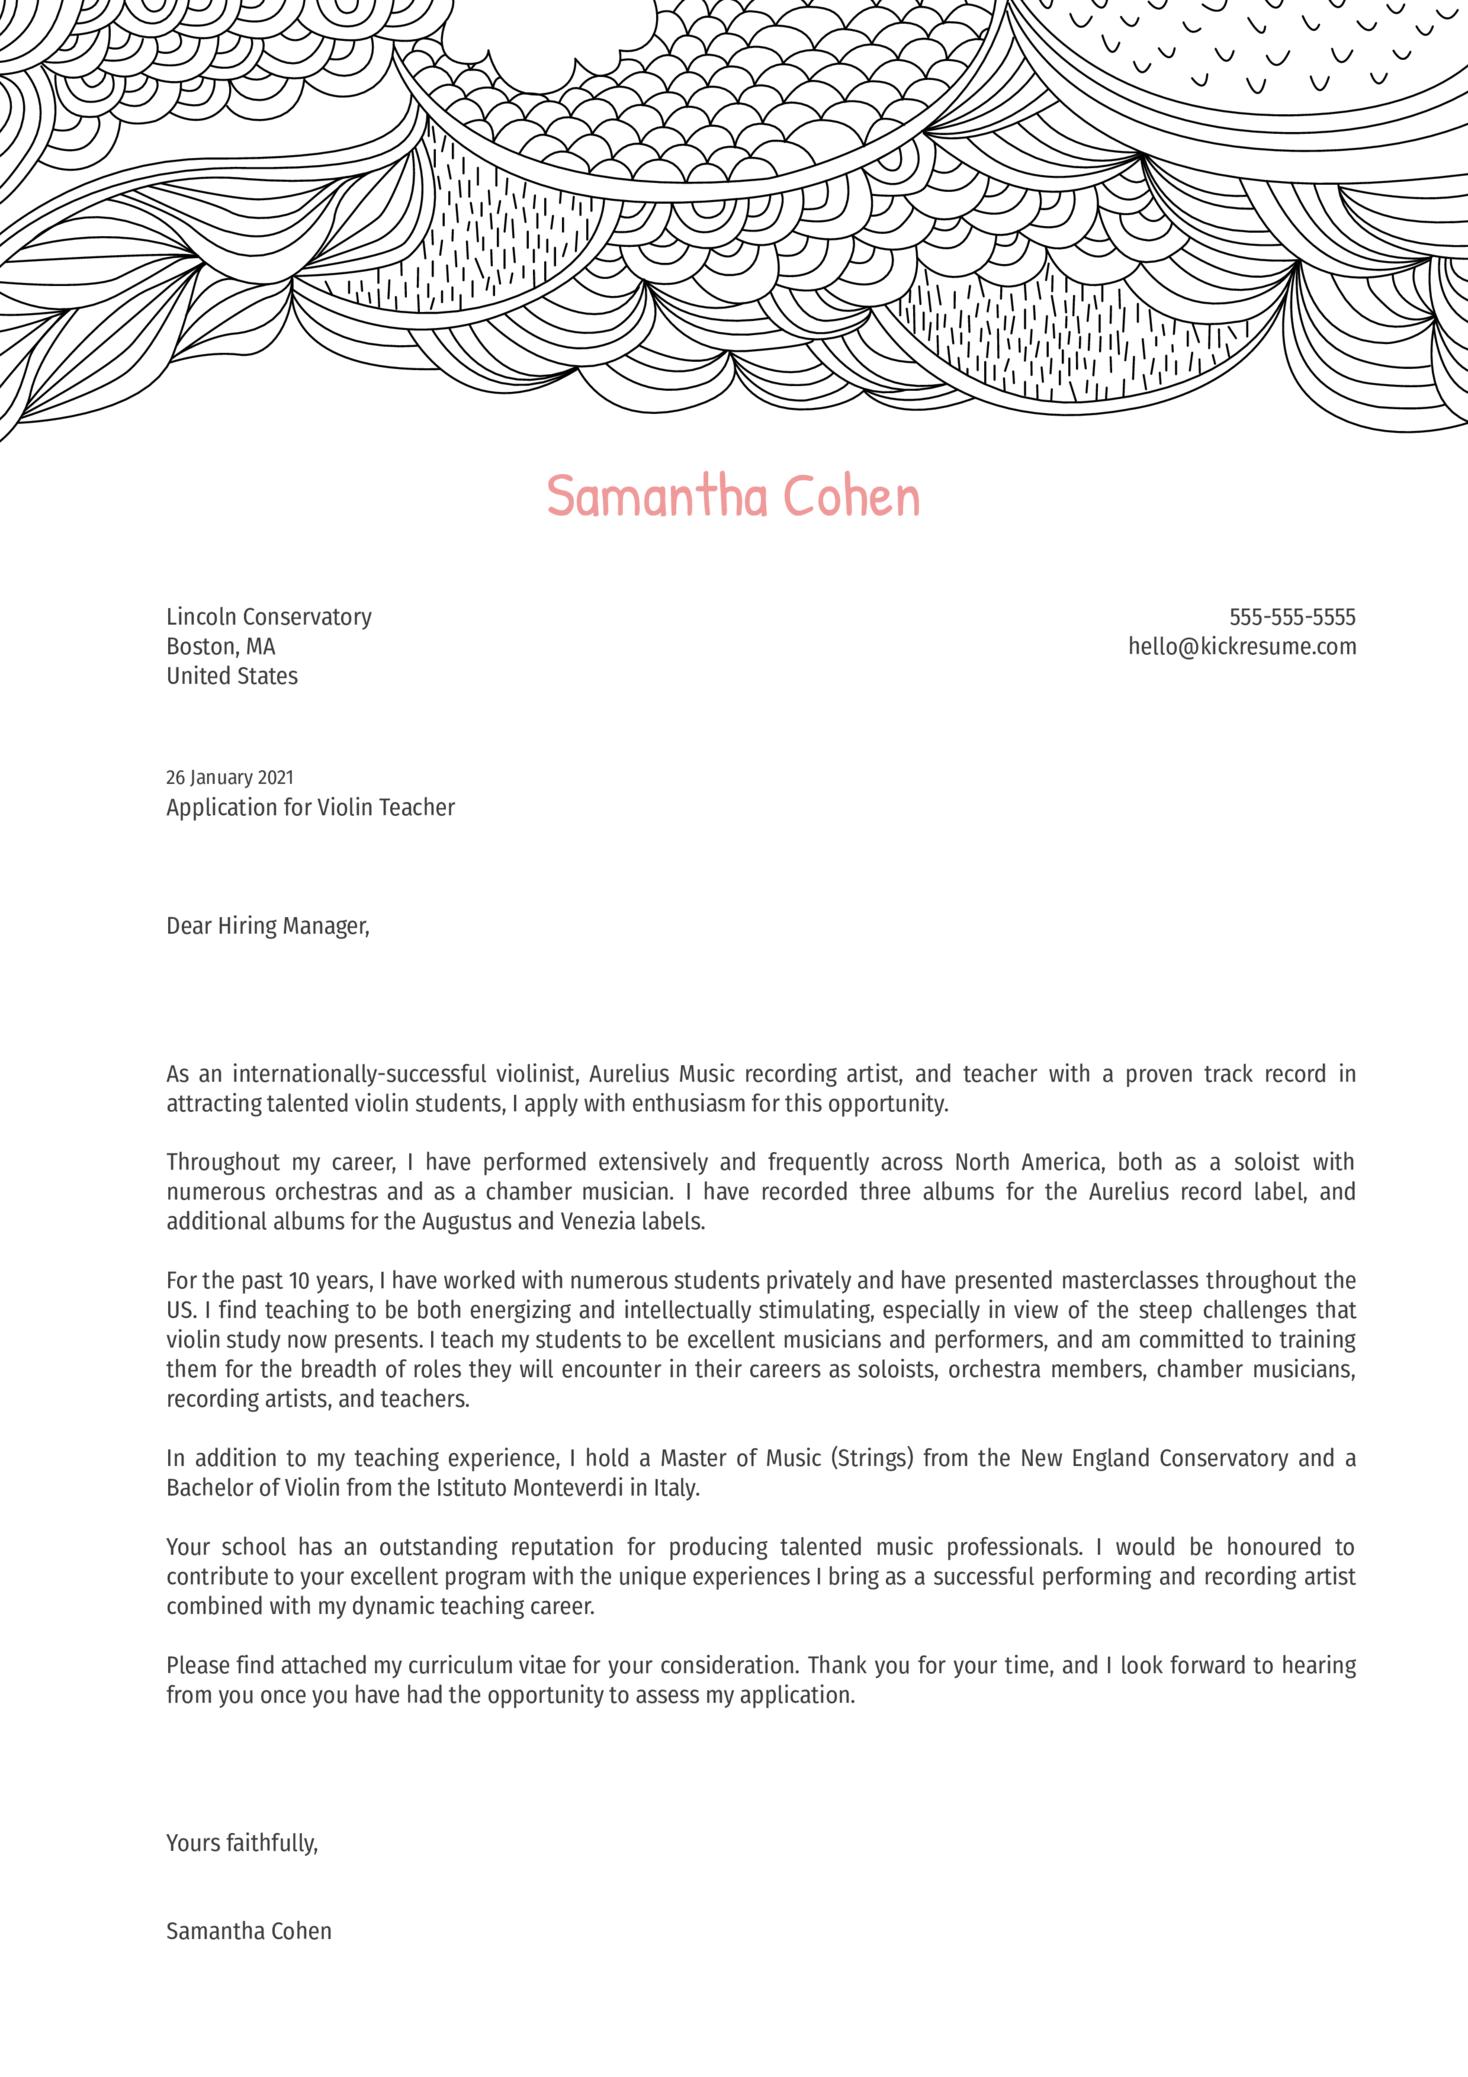 Violin Teacher Cover Letter Example